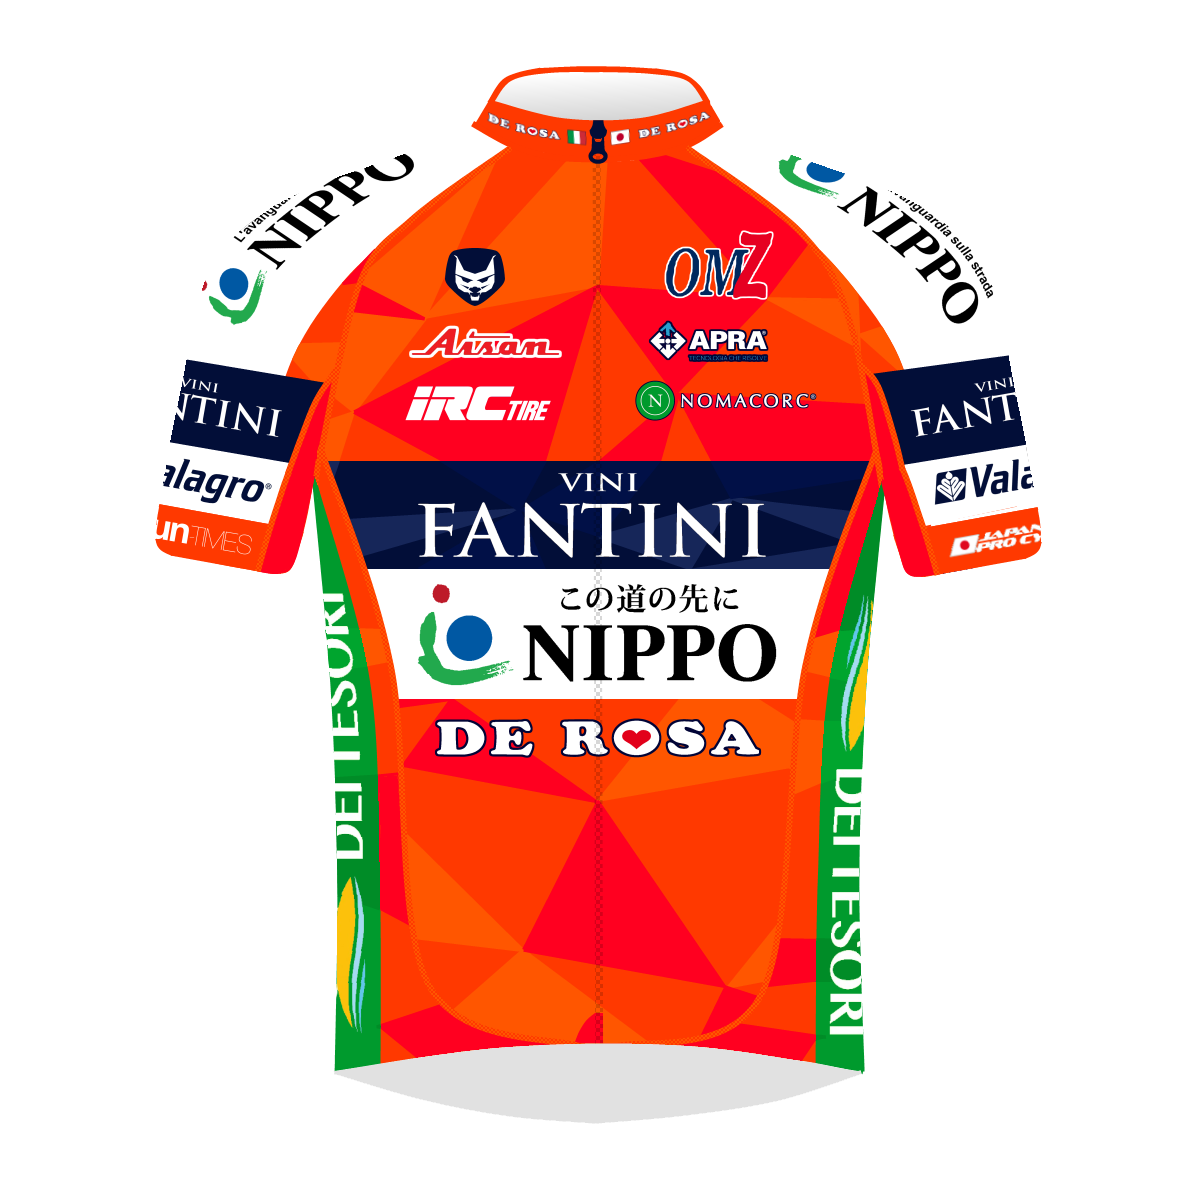 Nippo-Vini Fantini